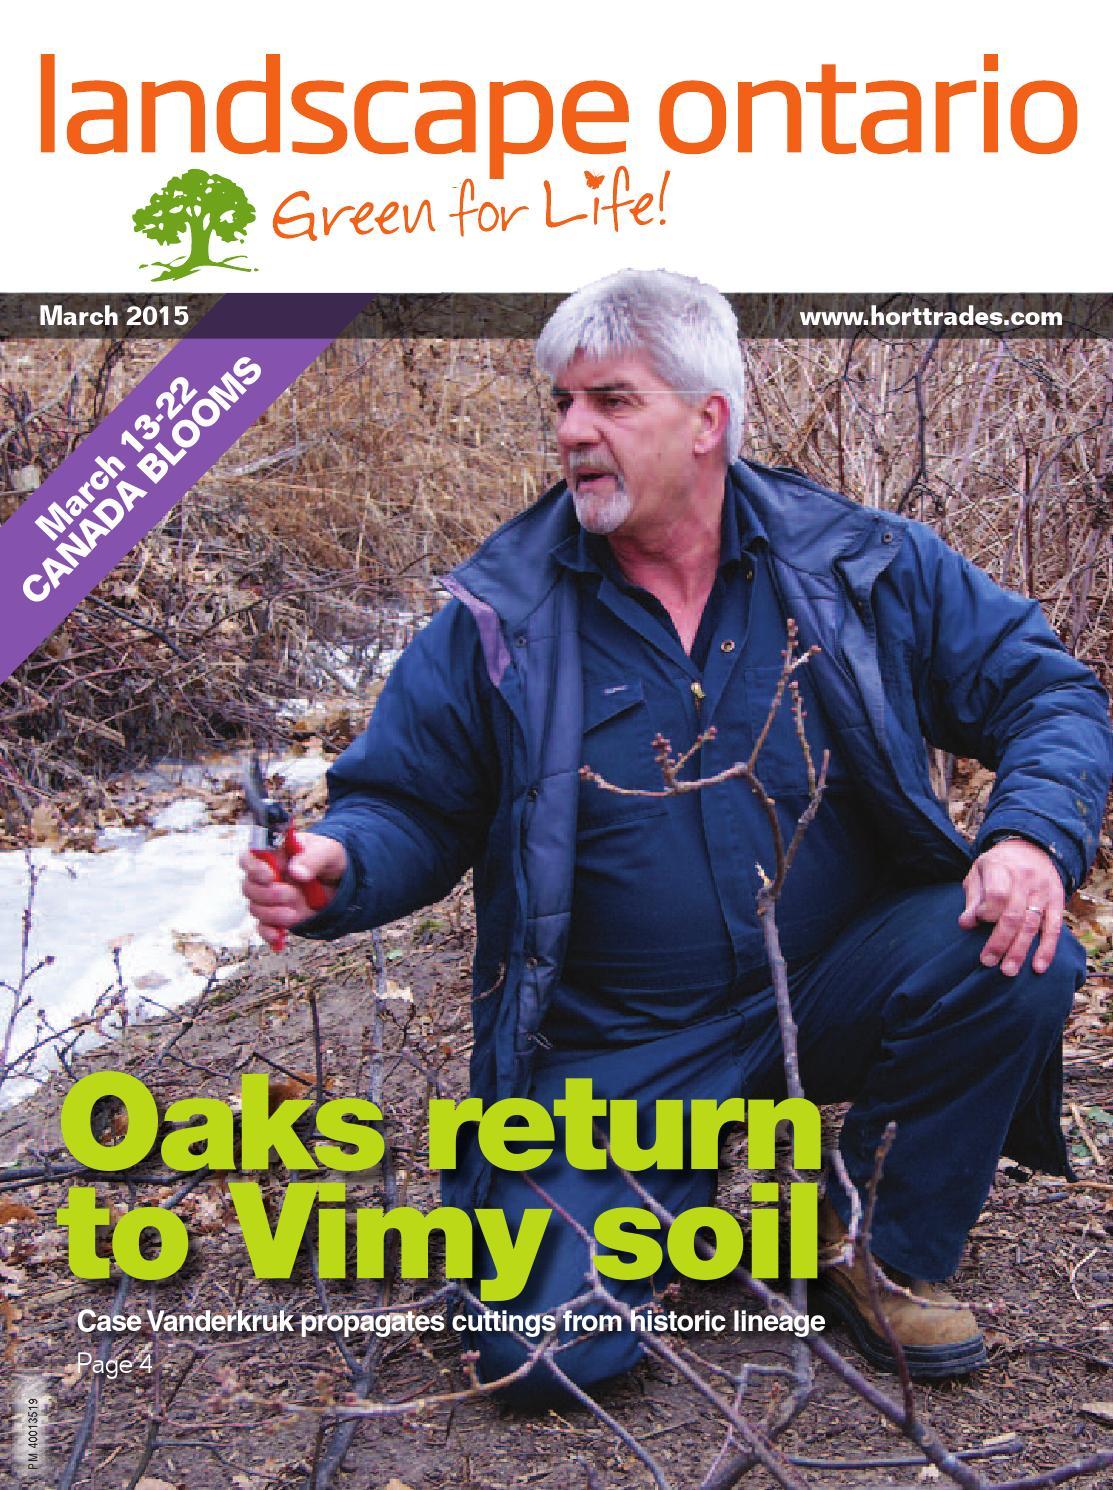 Landscape Ontario February 2013 By Mike Wasilewski Issuu